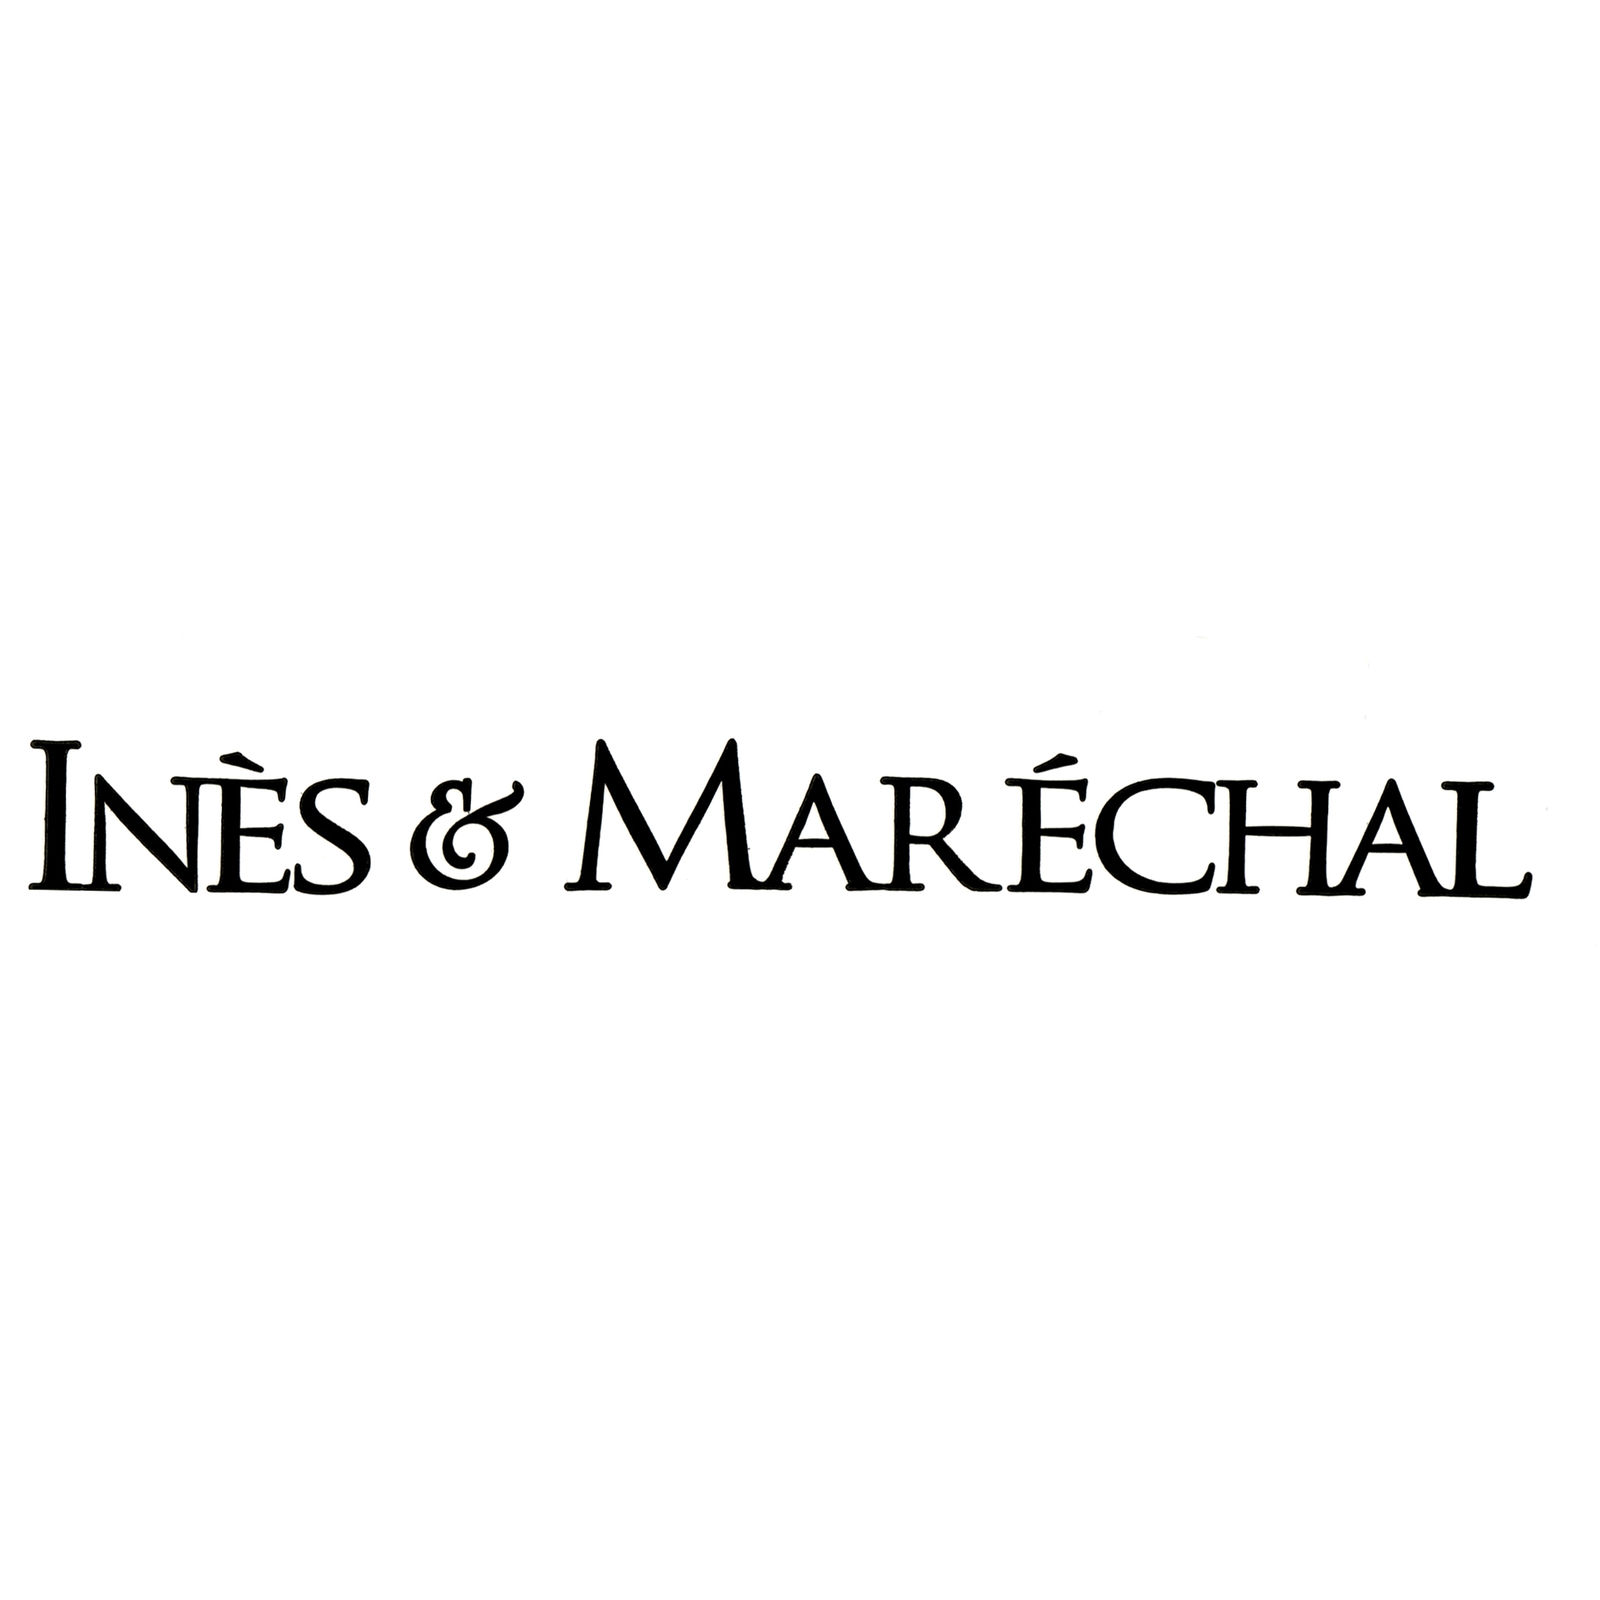 INÈS & MARÉCHAL